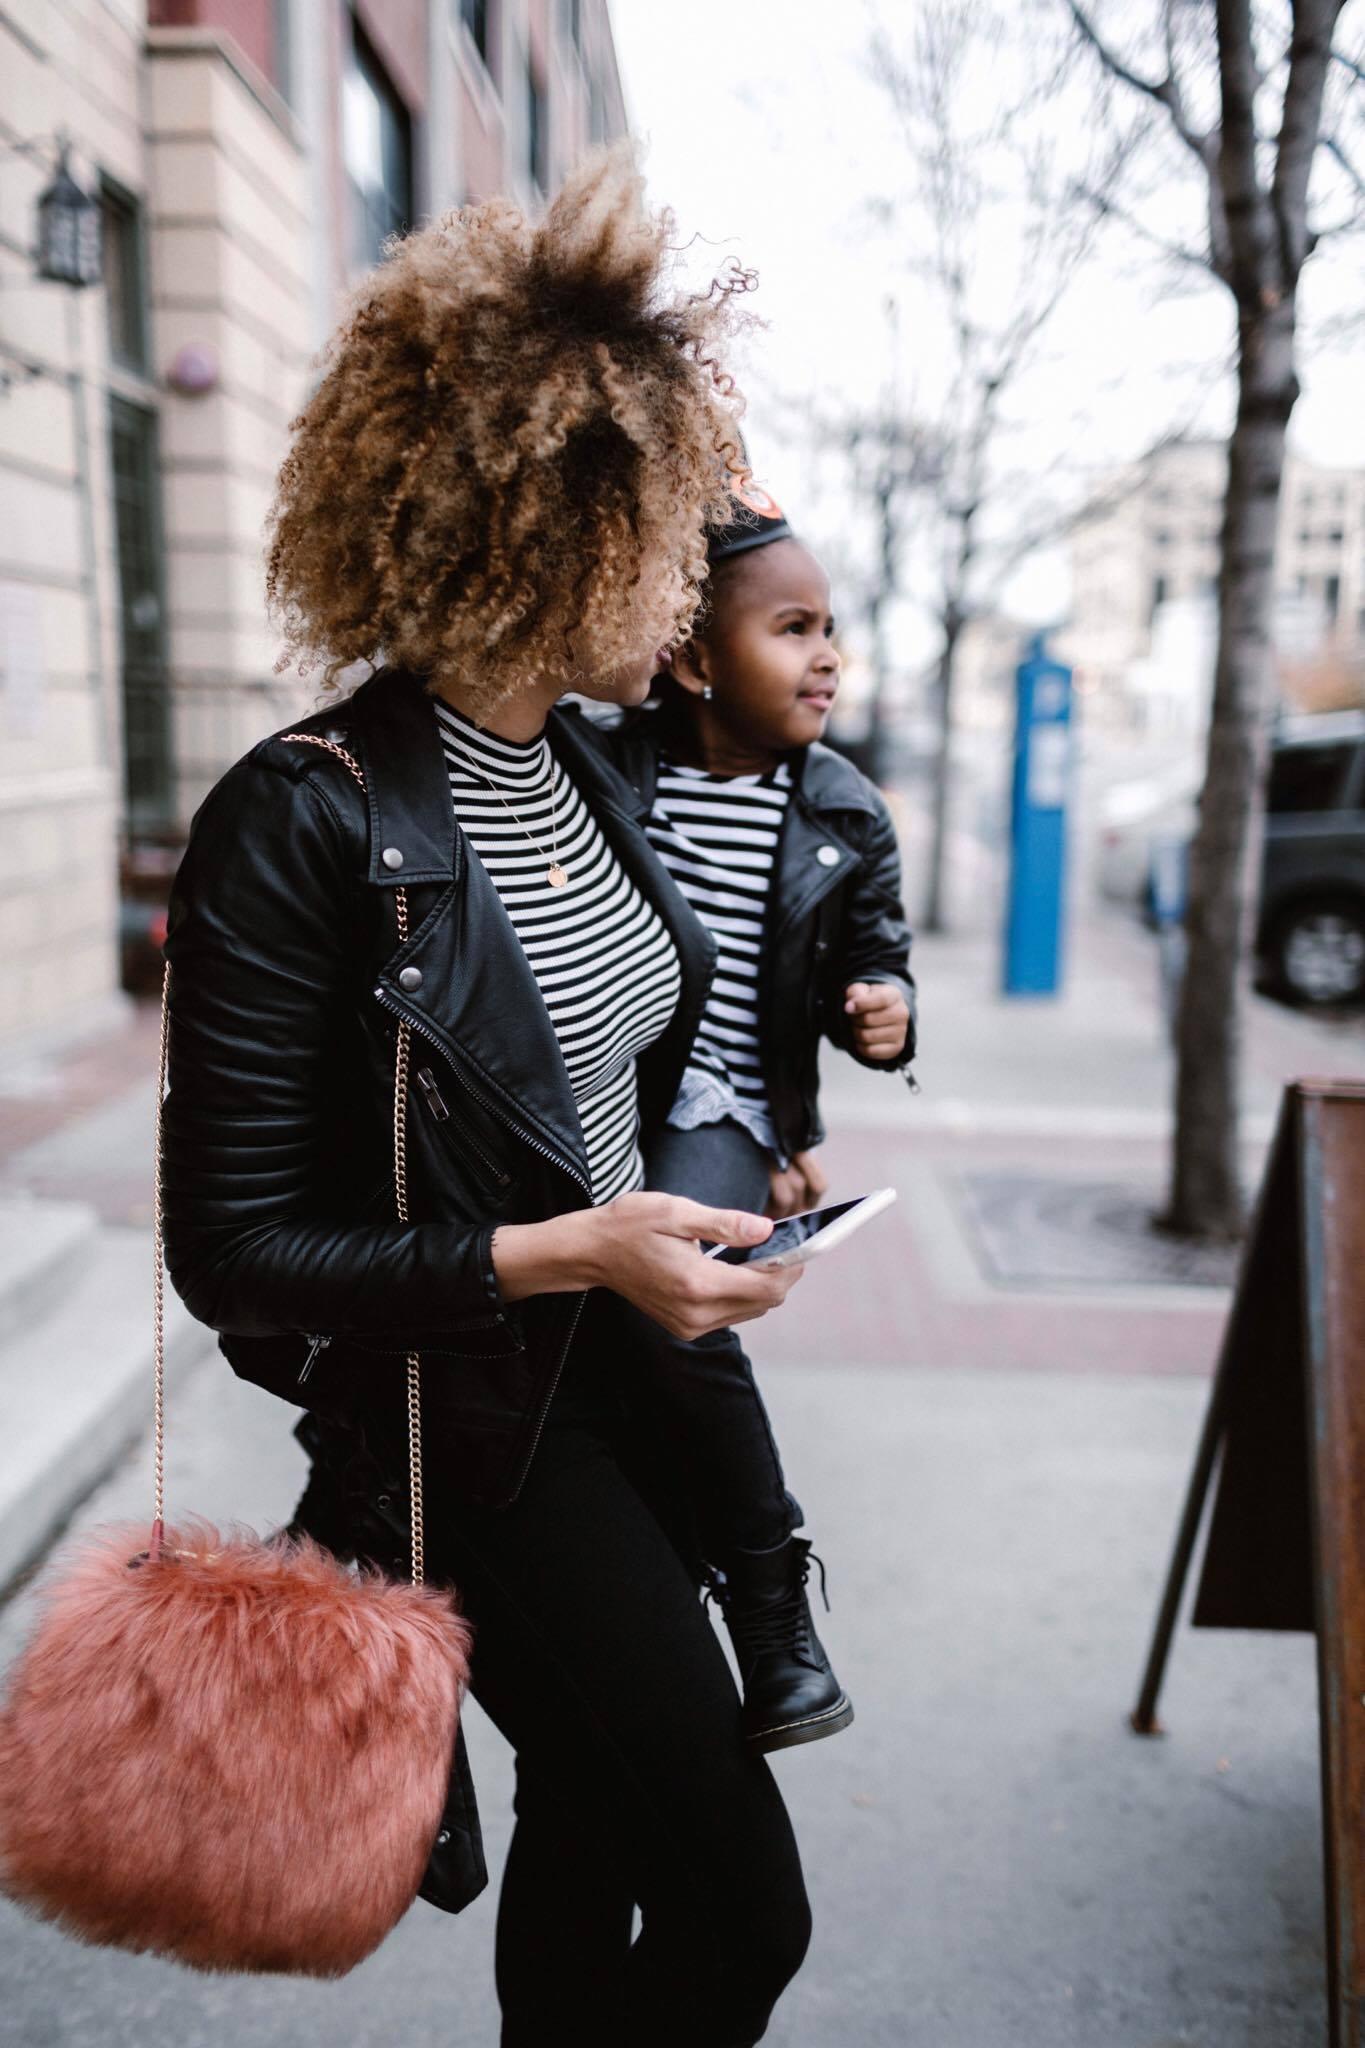 Raising an Emotionally Healthy Daughter by popular SLC mommy blogger Destiney of MomCrushMonday